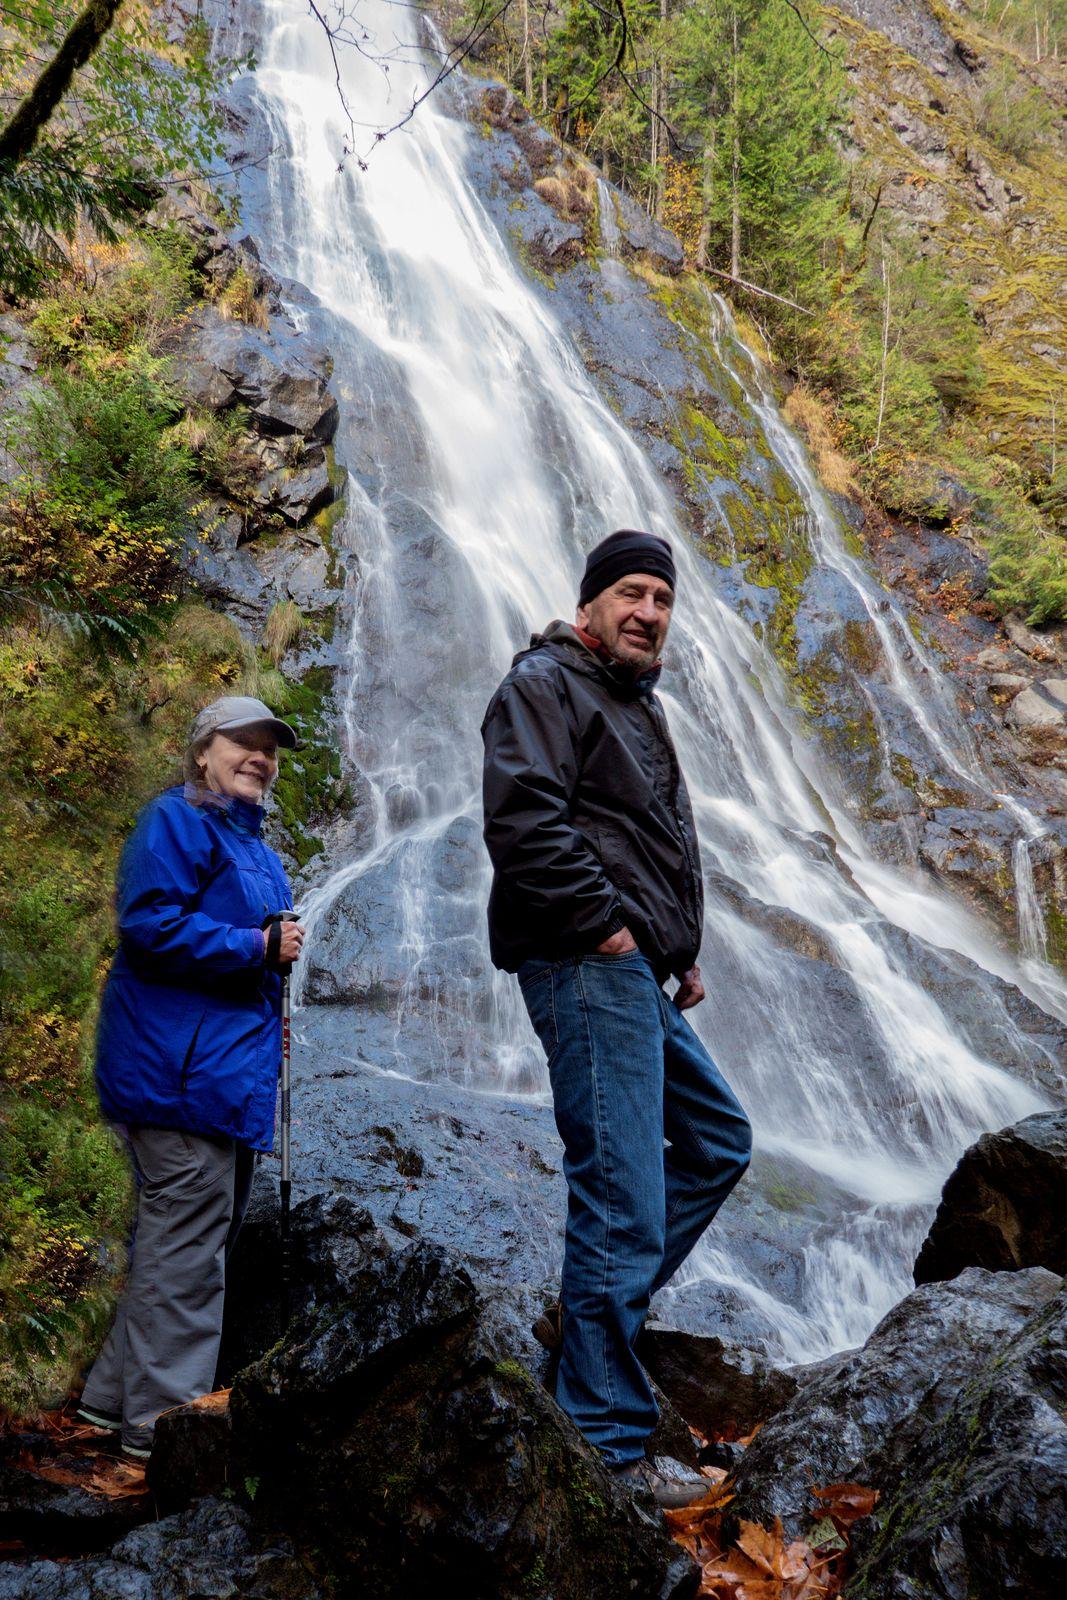 Sarah and Denny enjoy the falls